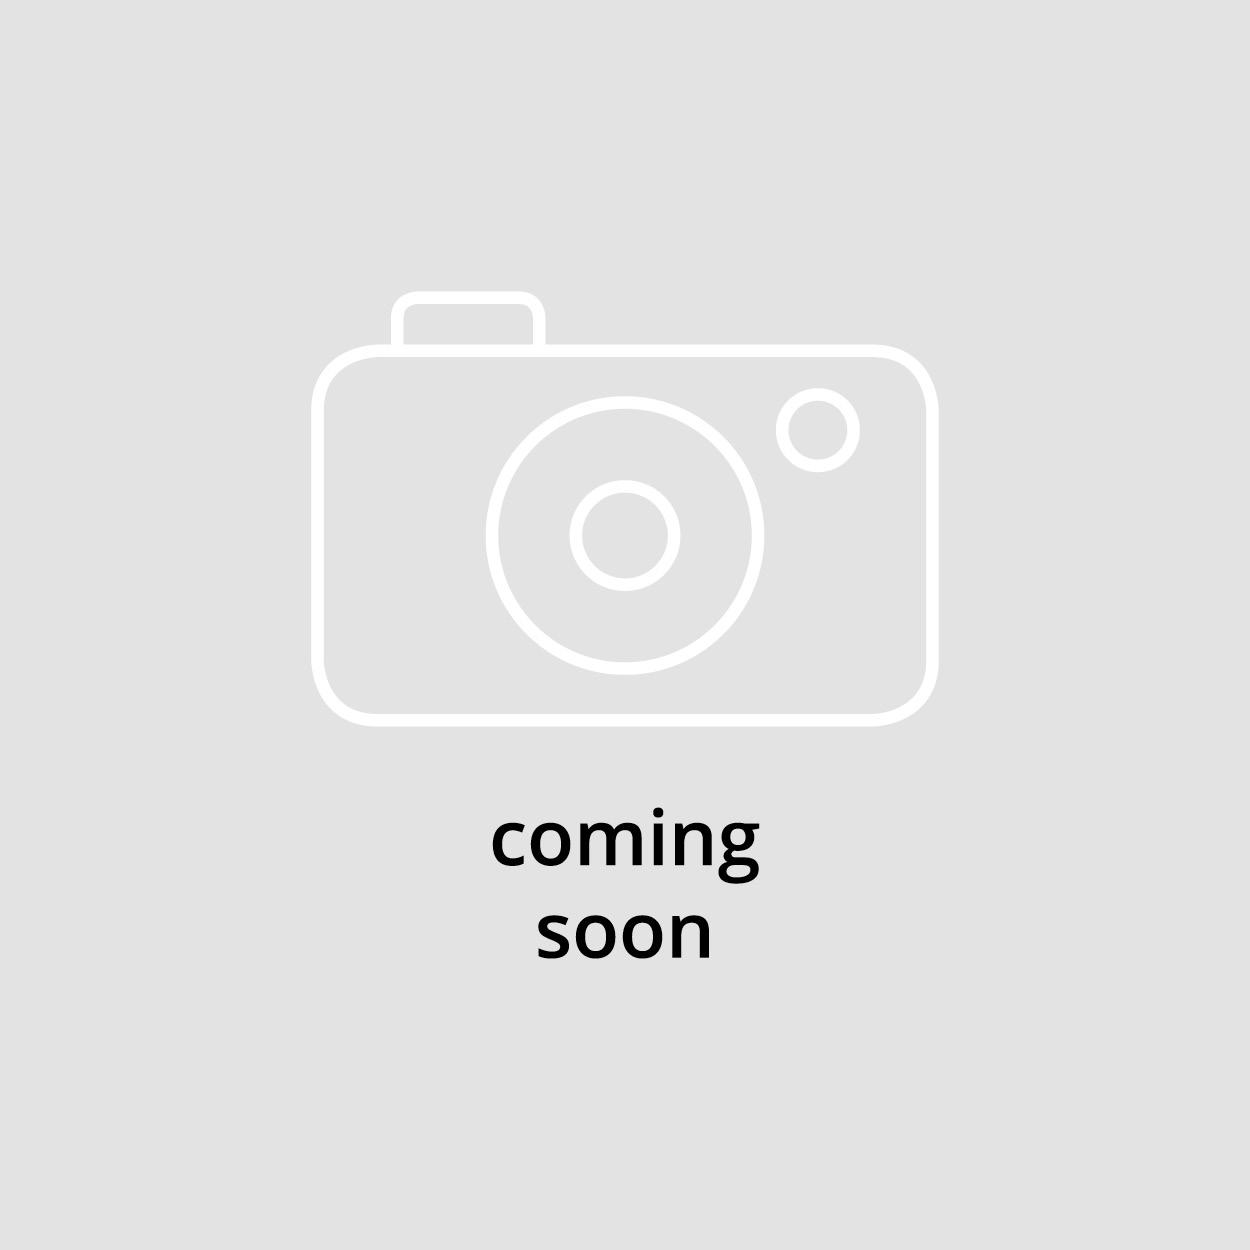 35.01.148 Tirante per chiusura pinza Gildemeister GM35, GM35AC